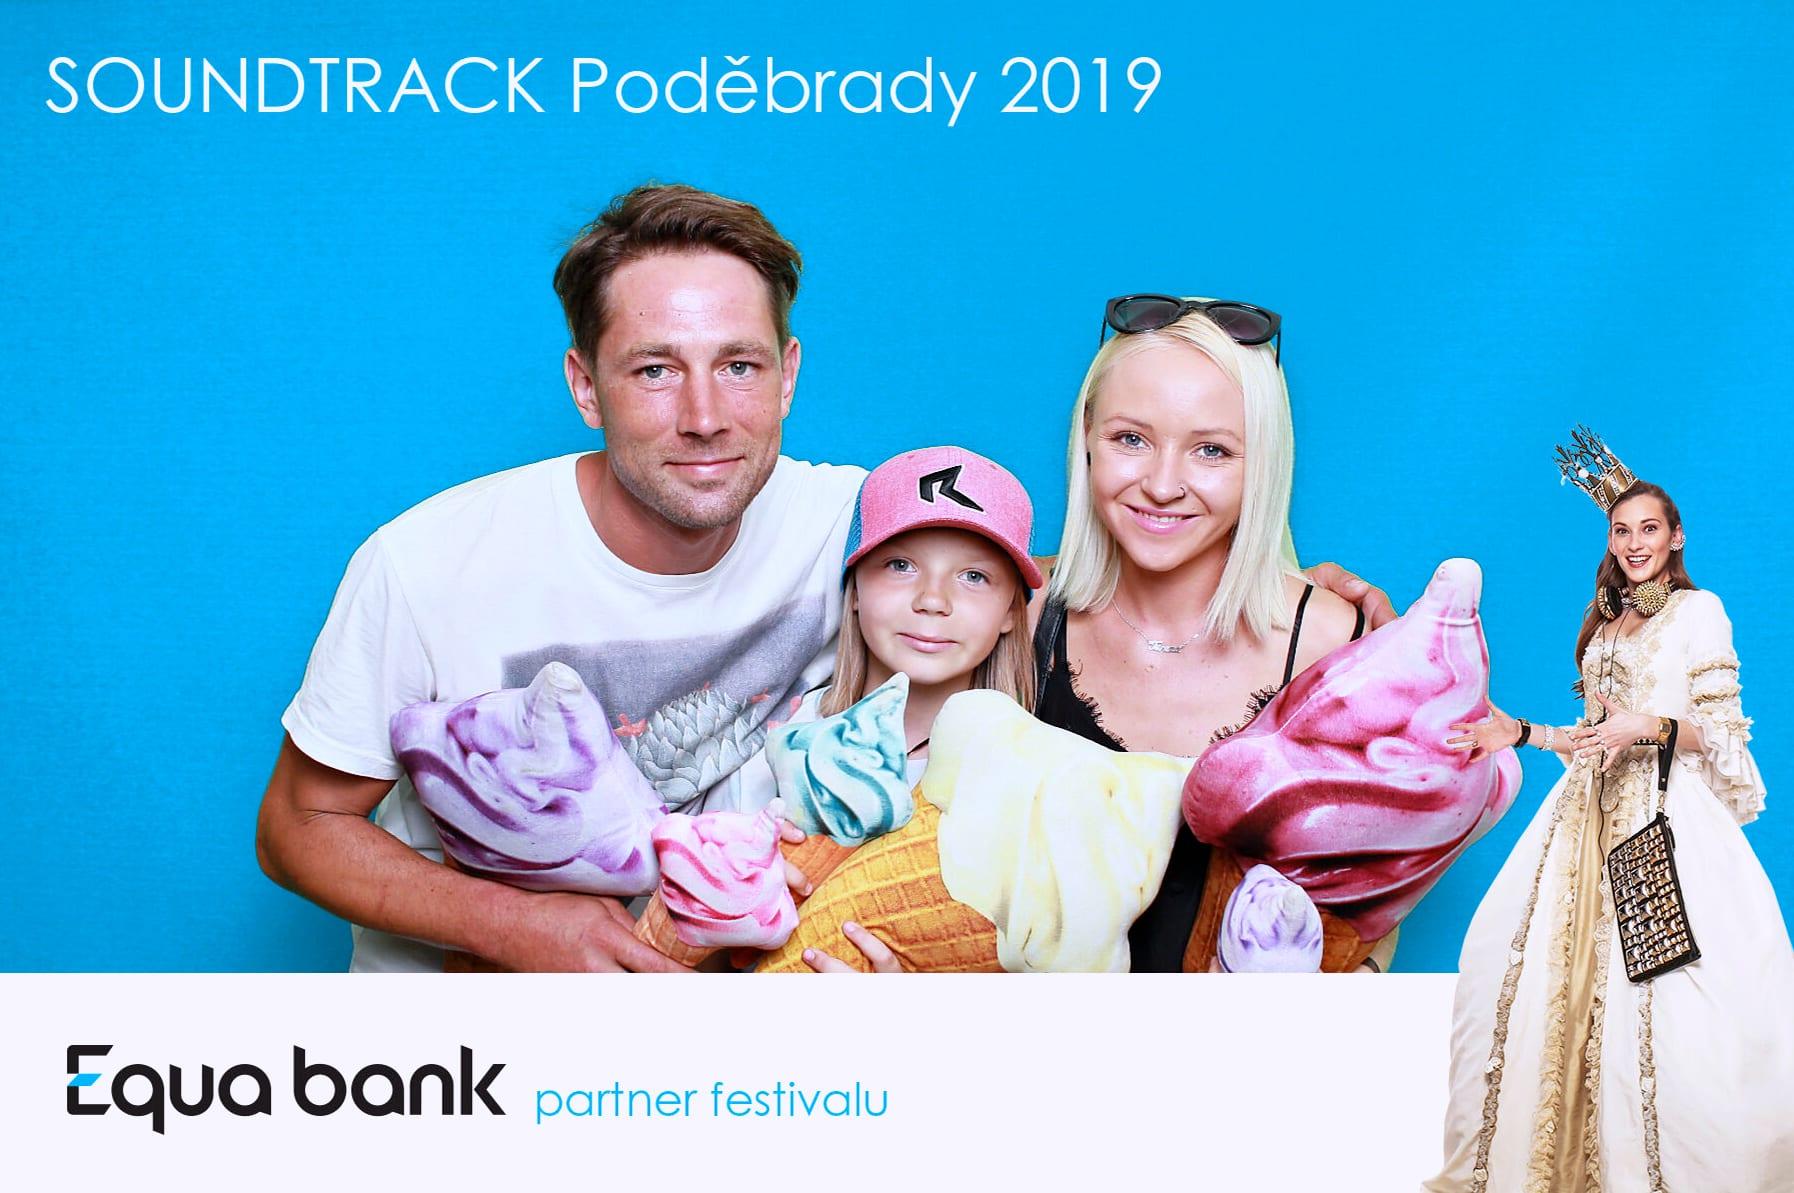 fotokoutek-festival-praha-equa-bank-1-9-2019-647197